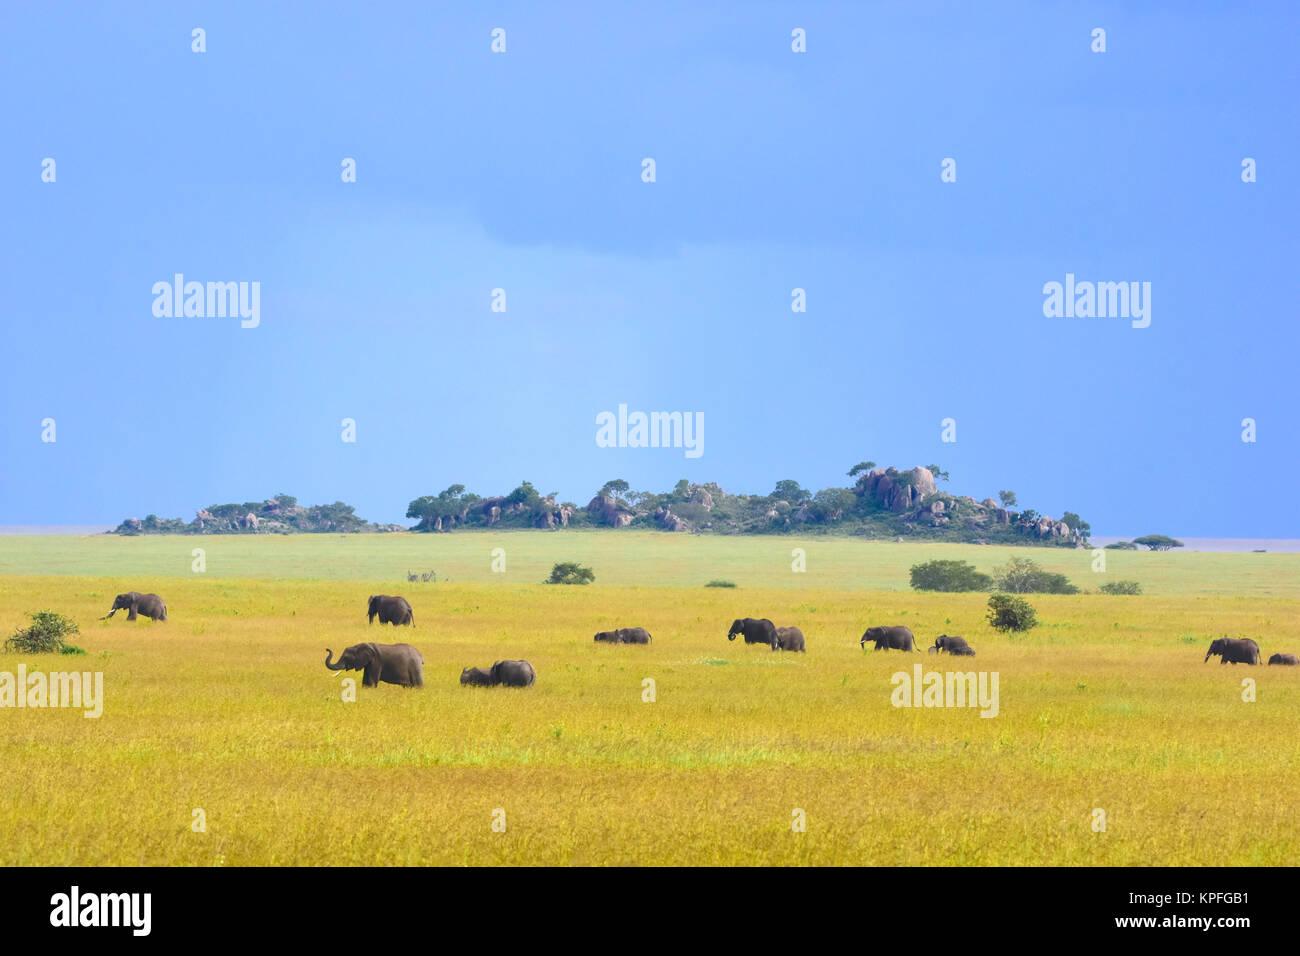 Wildlife sightseeing in one of the prime wildlife destinations on earht -- Serengeti, Tanzania. Herd of elephants - Stock Image